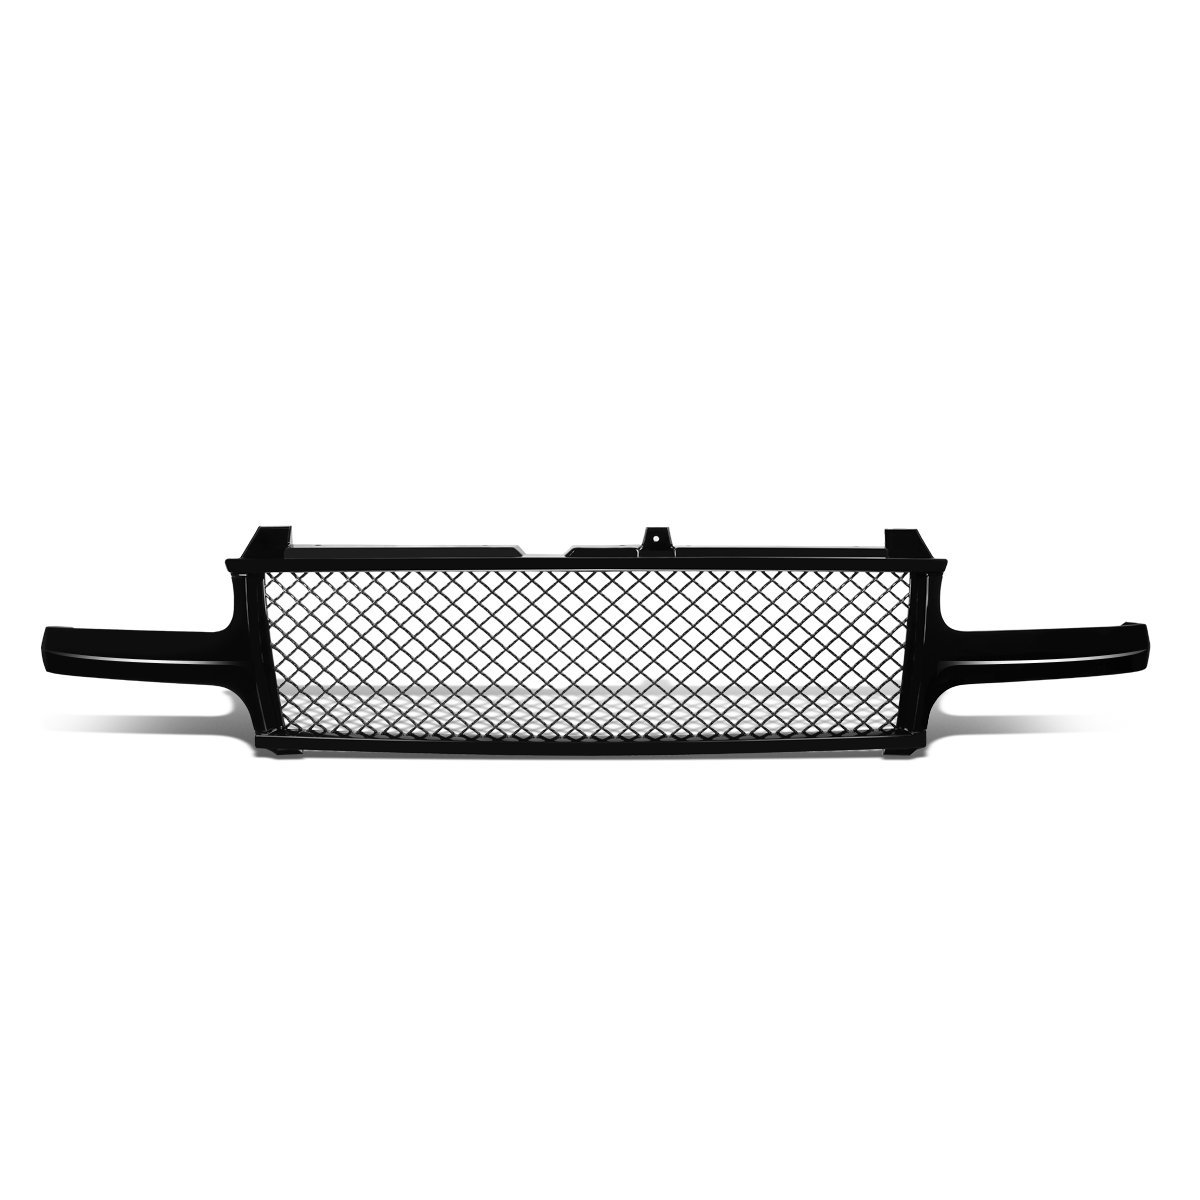 DNA Motoring GRF-107-BK Badgeless Diamond Mesh Front Bumper Grille For 99-06 Silverado//Tahoe//Suburban